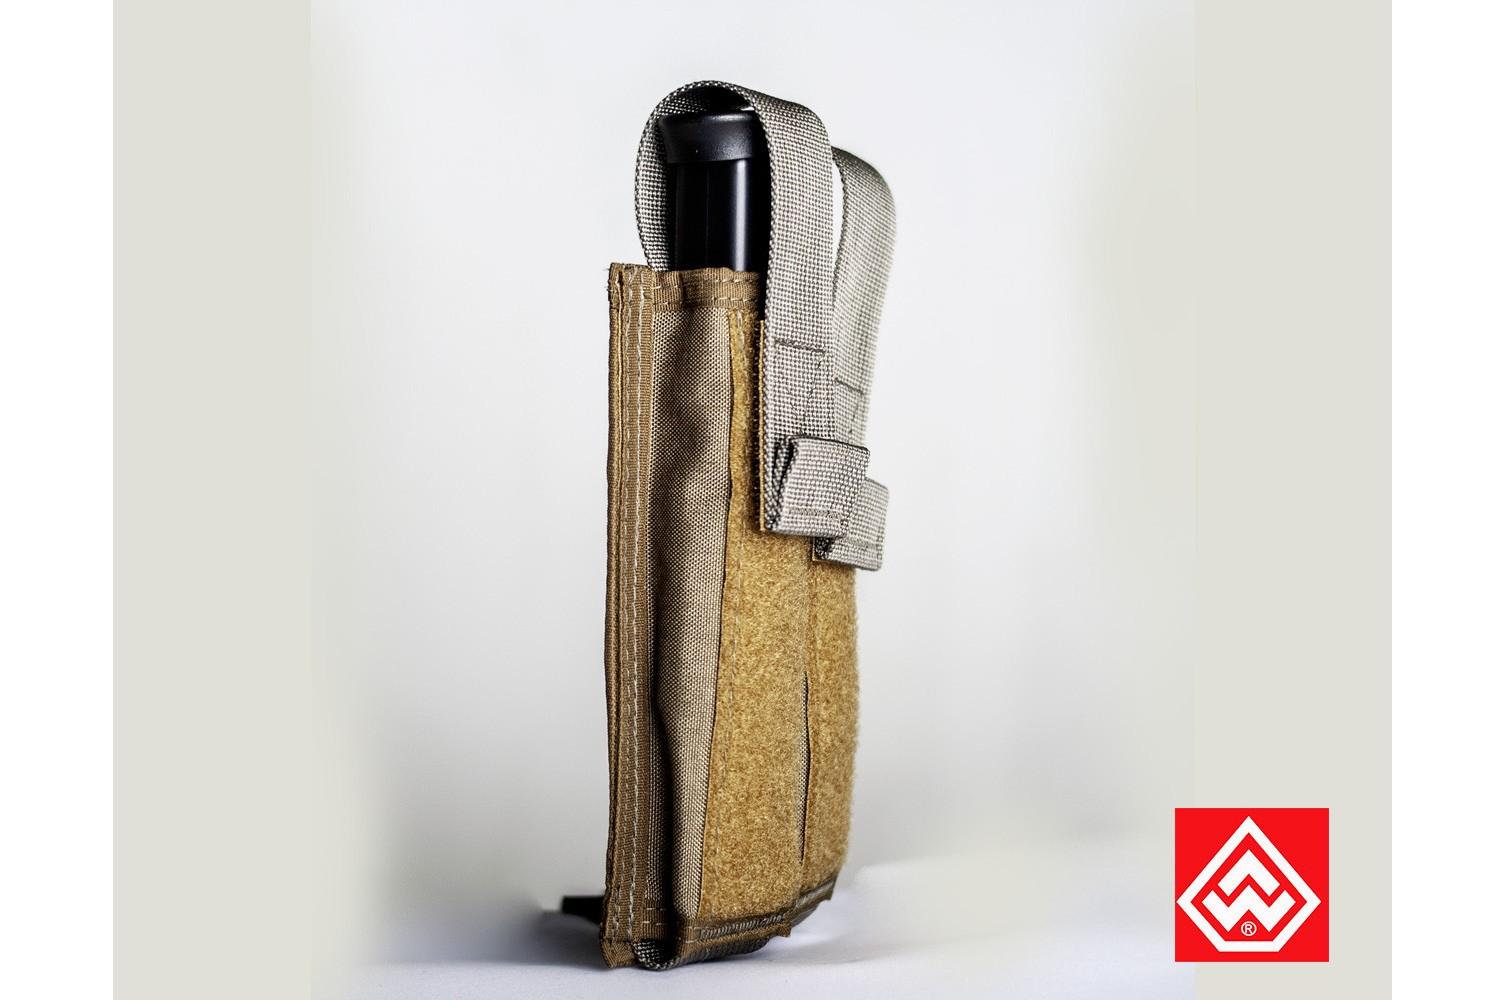 Porta Carregador 2x Carabina Taurus Ou MP5 - COYOTE